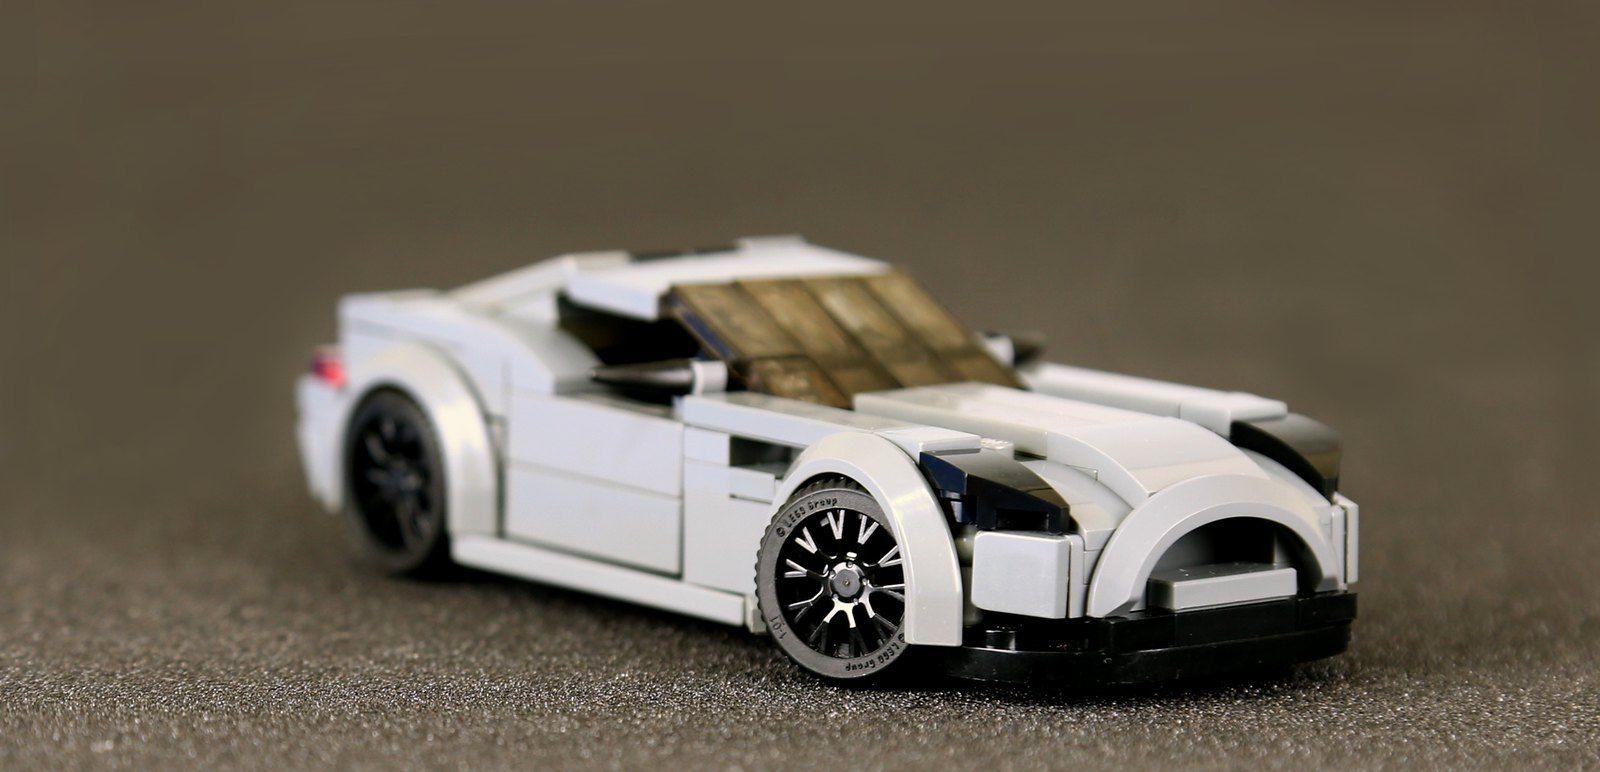 Aston Martin Db11 Lego Cars Aston Martin Aston Martin Db11